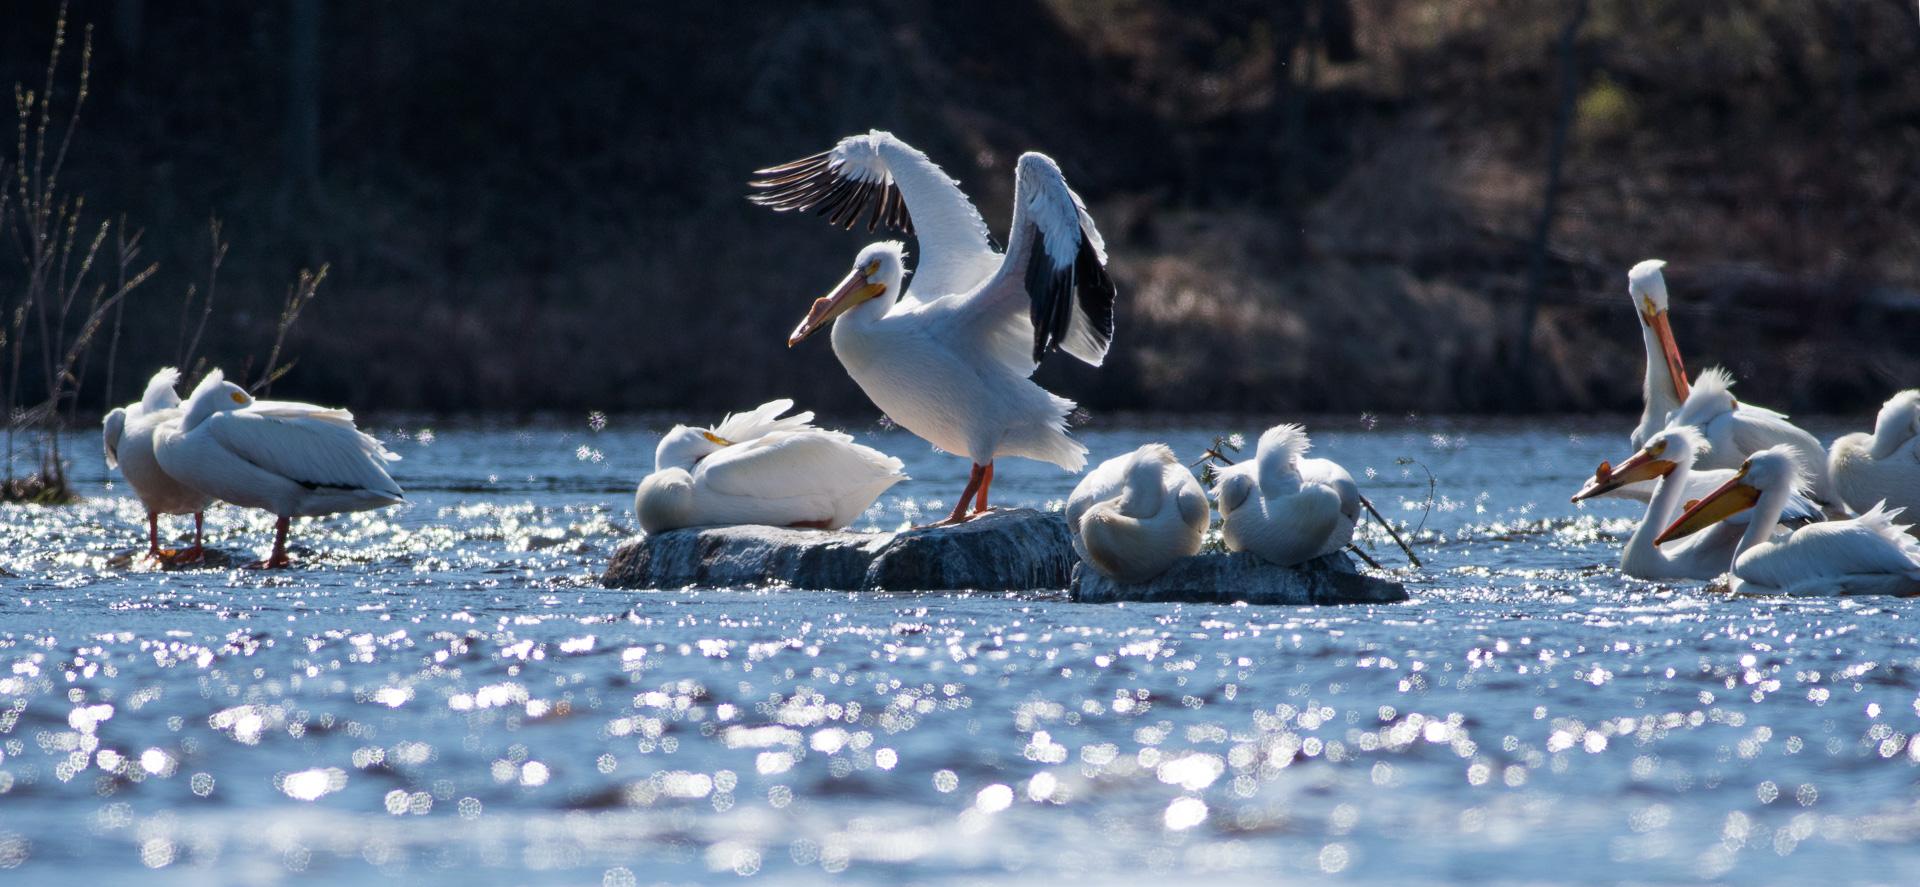 American White Pelican St. Louis River Fond du Lac Duluth MN-06899